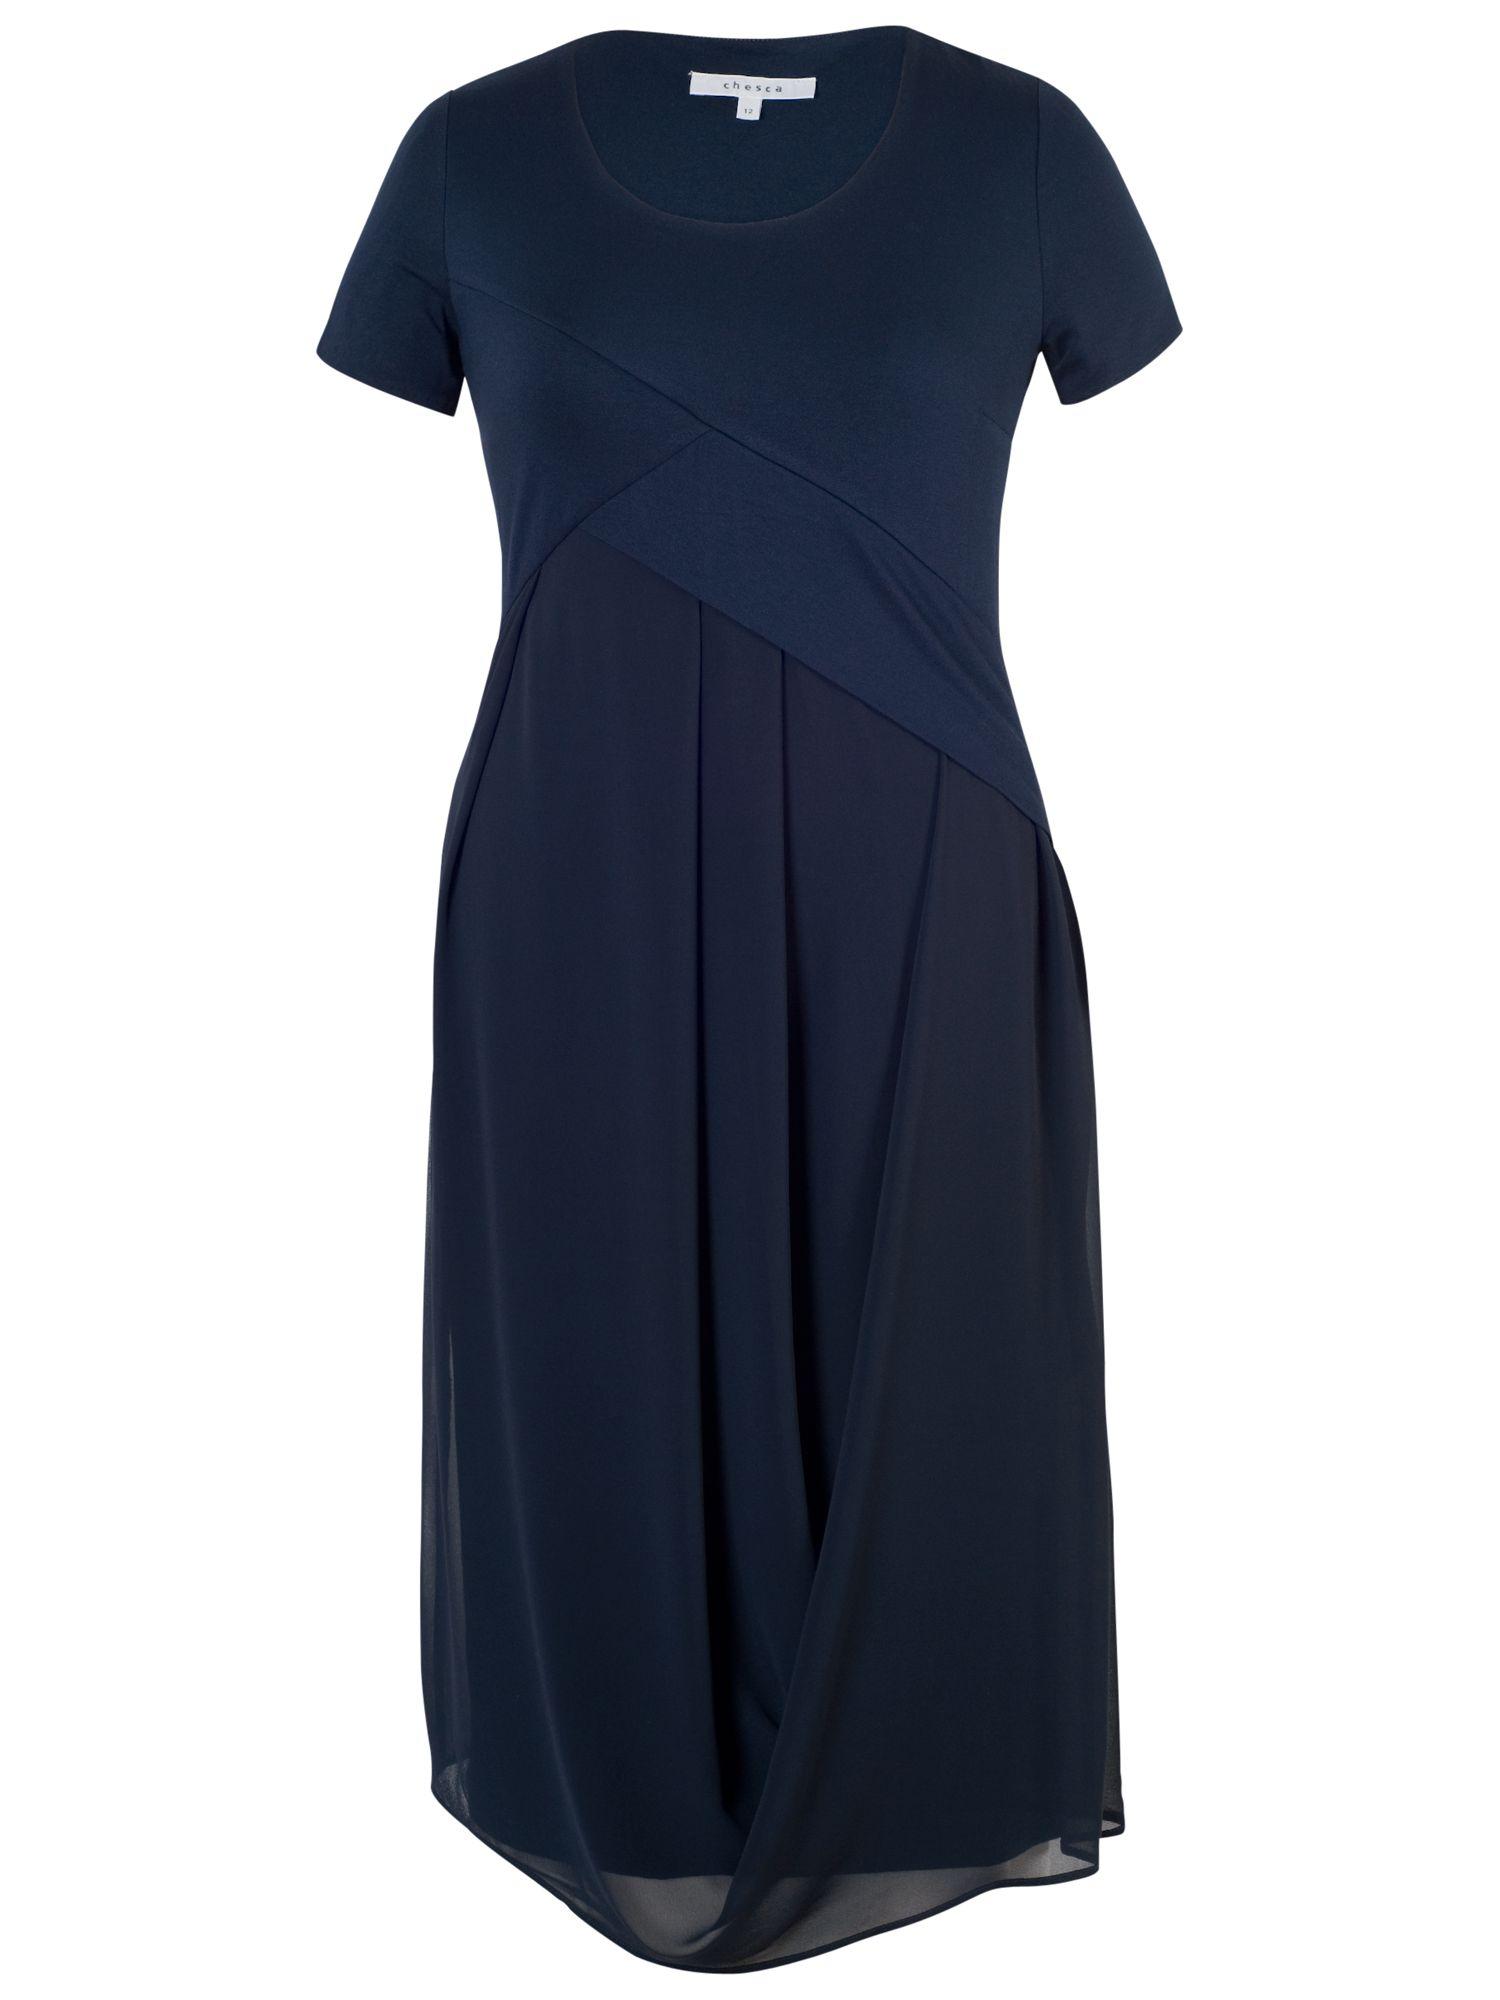 chesca chiffon jersey dress navy, chesca, chiffon, jersey, dress, navy, 14|22|18|20|16, women, plus size, womens dresses, 1879429